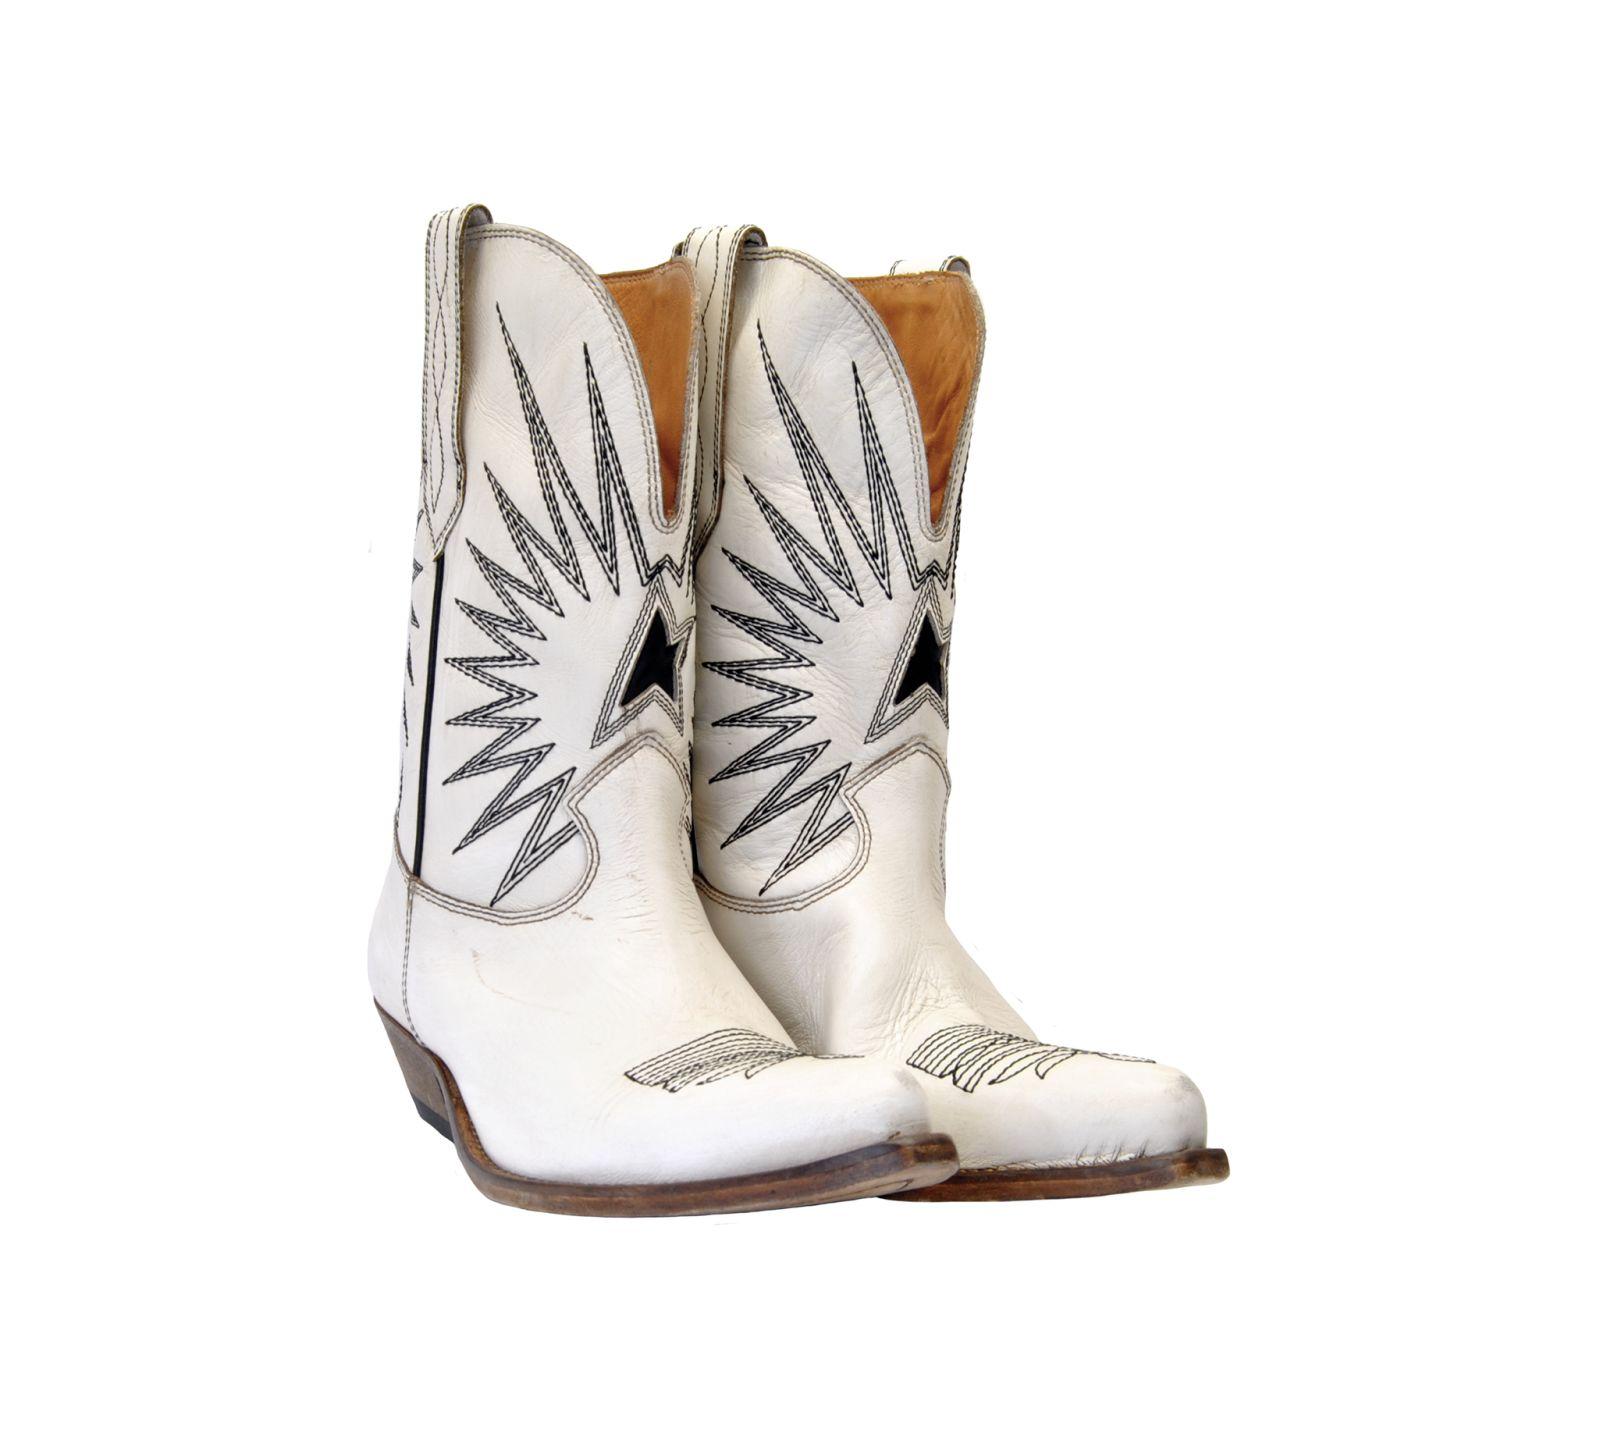 Golden Goose Golden Goose Wish Star Cowboy Boots - White - 10834083 ... 484eee0ce0b